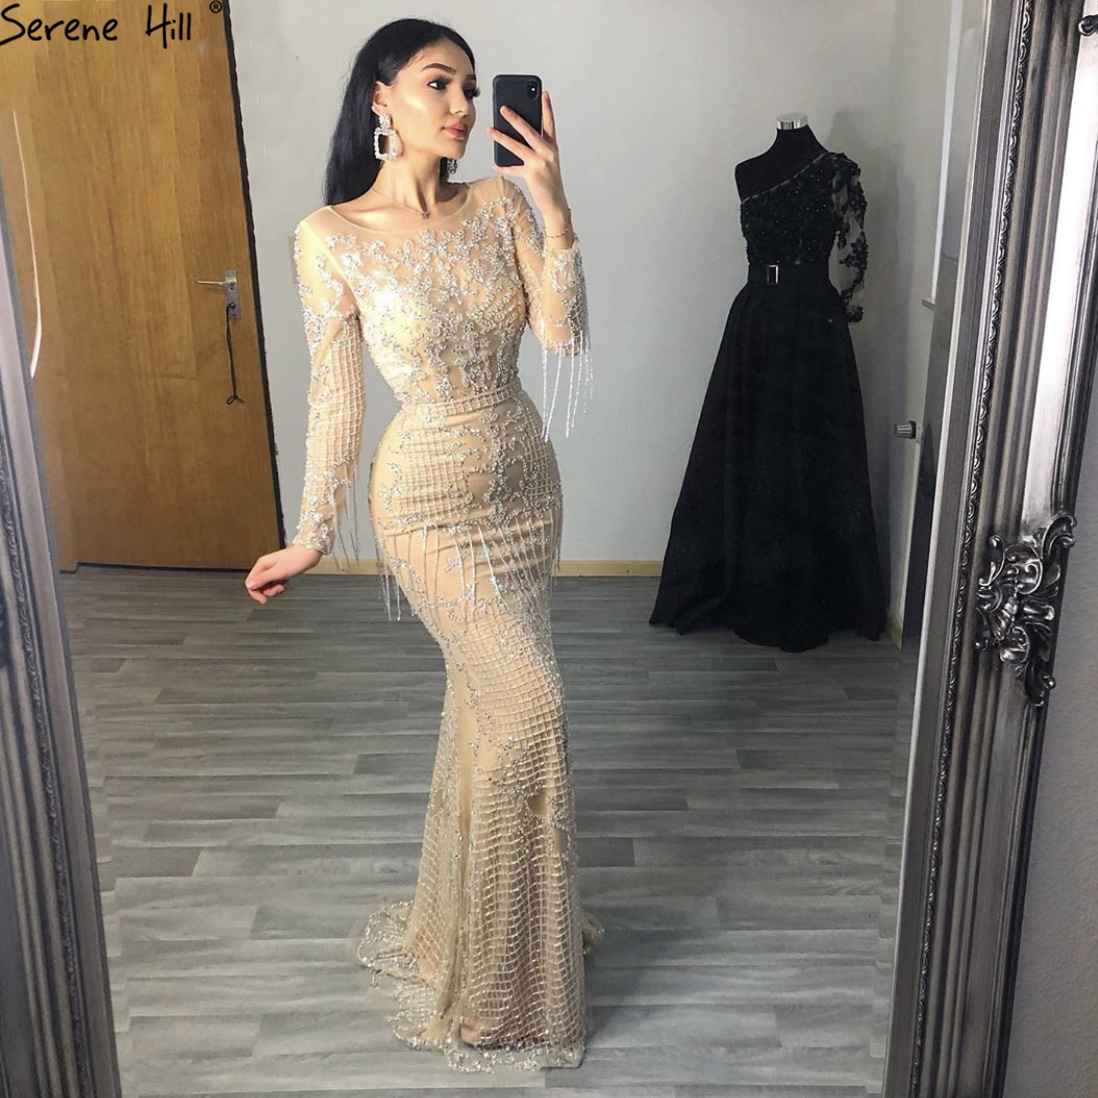 Serene Hill Gold Luxury Beaded Tassel Evening Gown 2021 Mermaid Long Sleeves O Neck For Muslim Women Formal Party Dress CLA60707